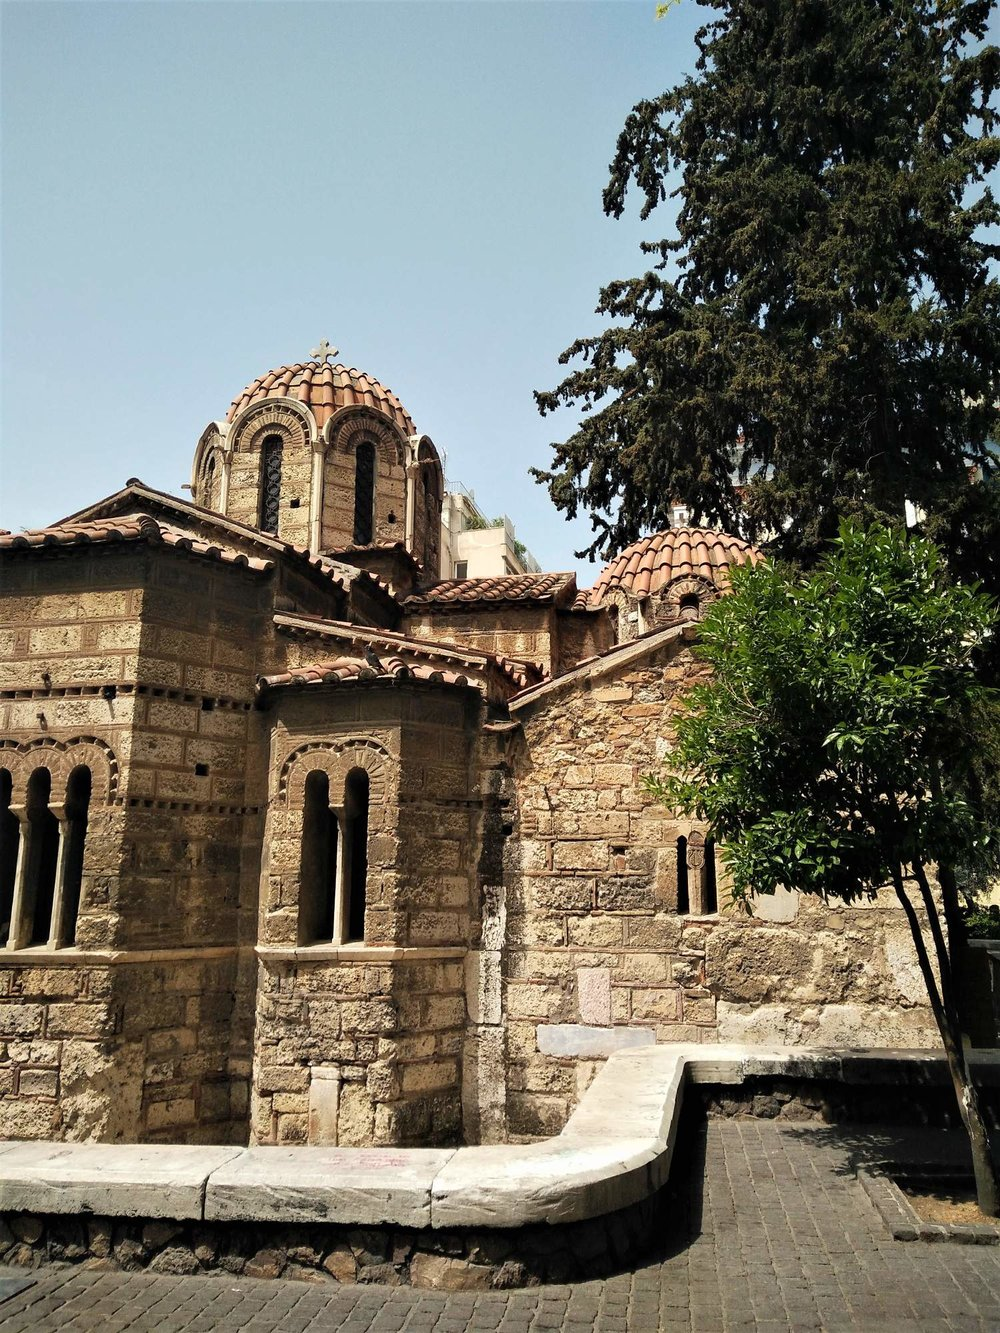 Kapnikarea church at Ermou Street. Source: Truevoyagers